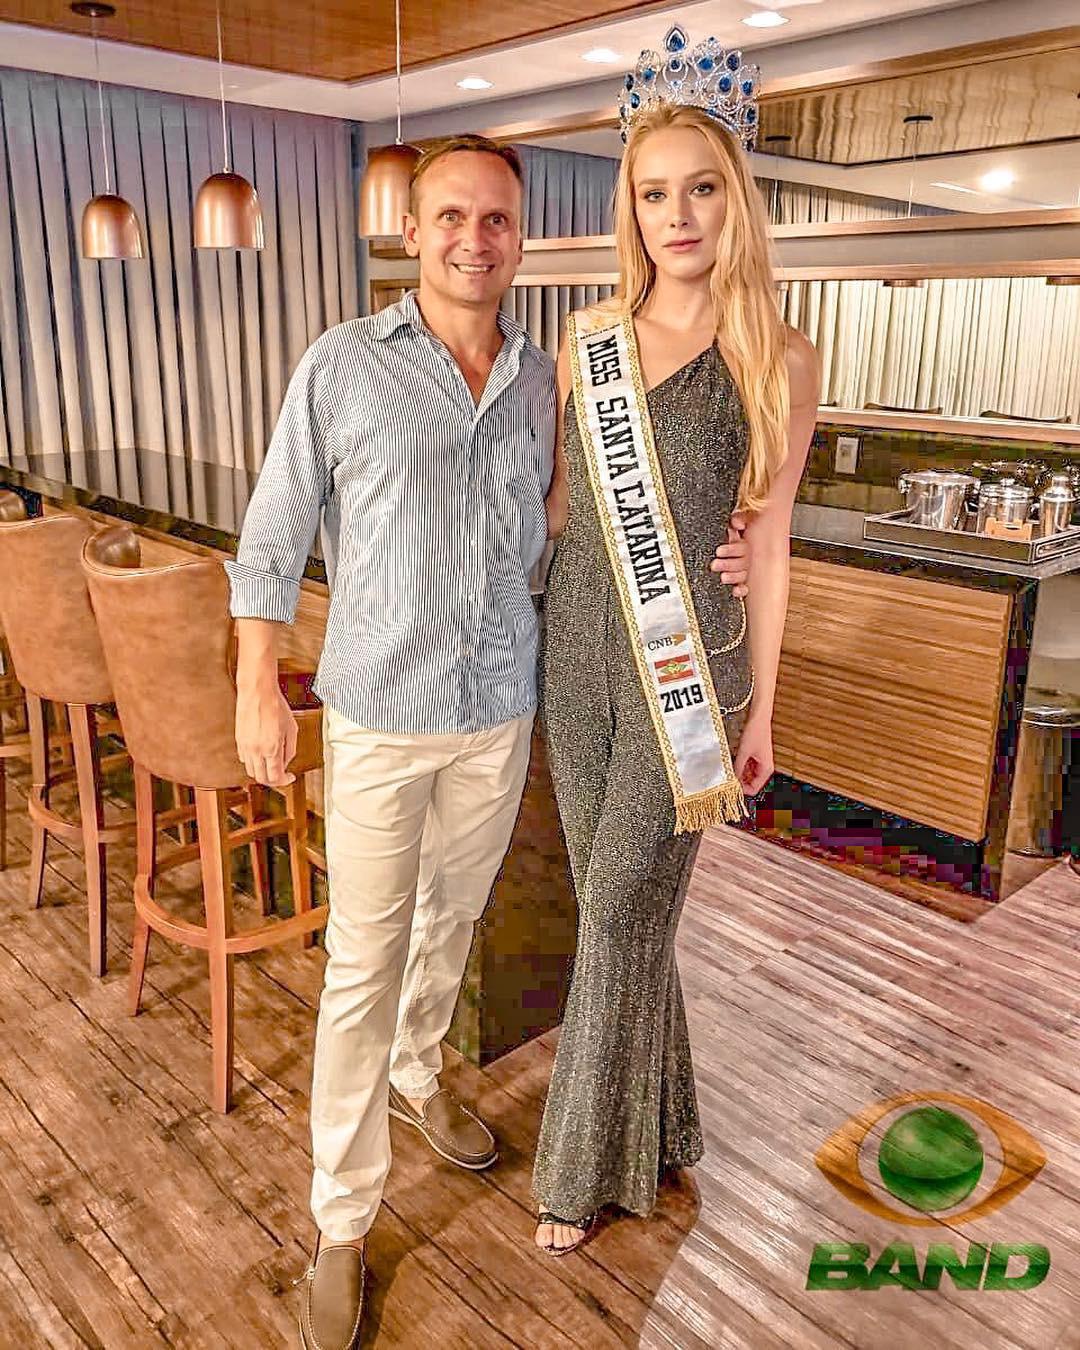 elizama aguilar, top 5 de miss brasil mundo 2019. - Página 3 Bd27vs10